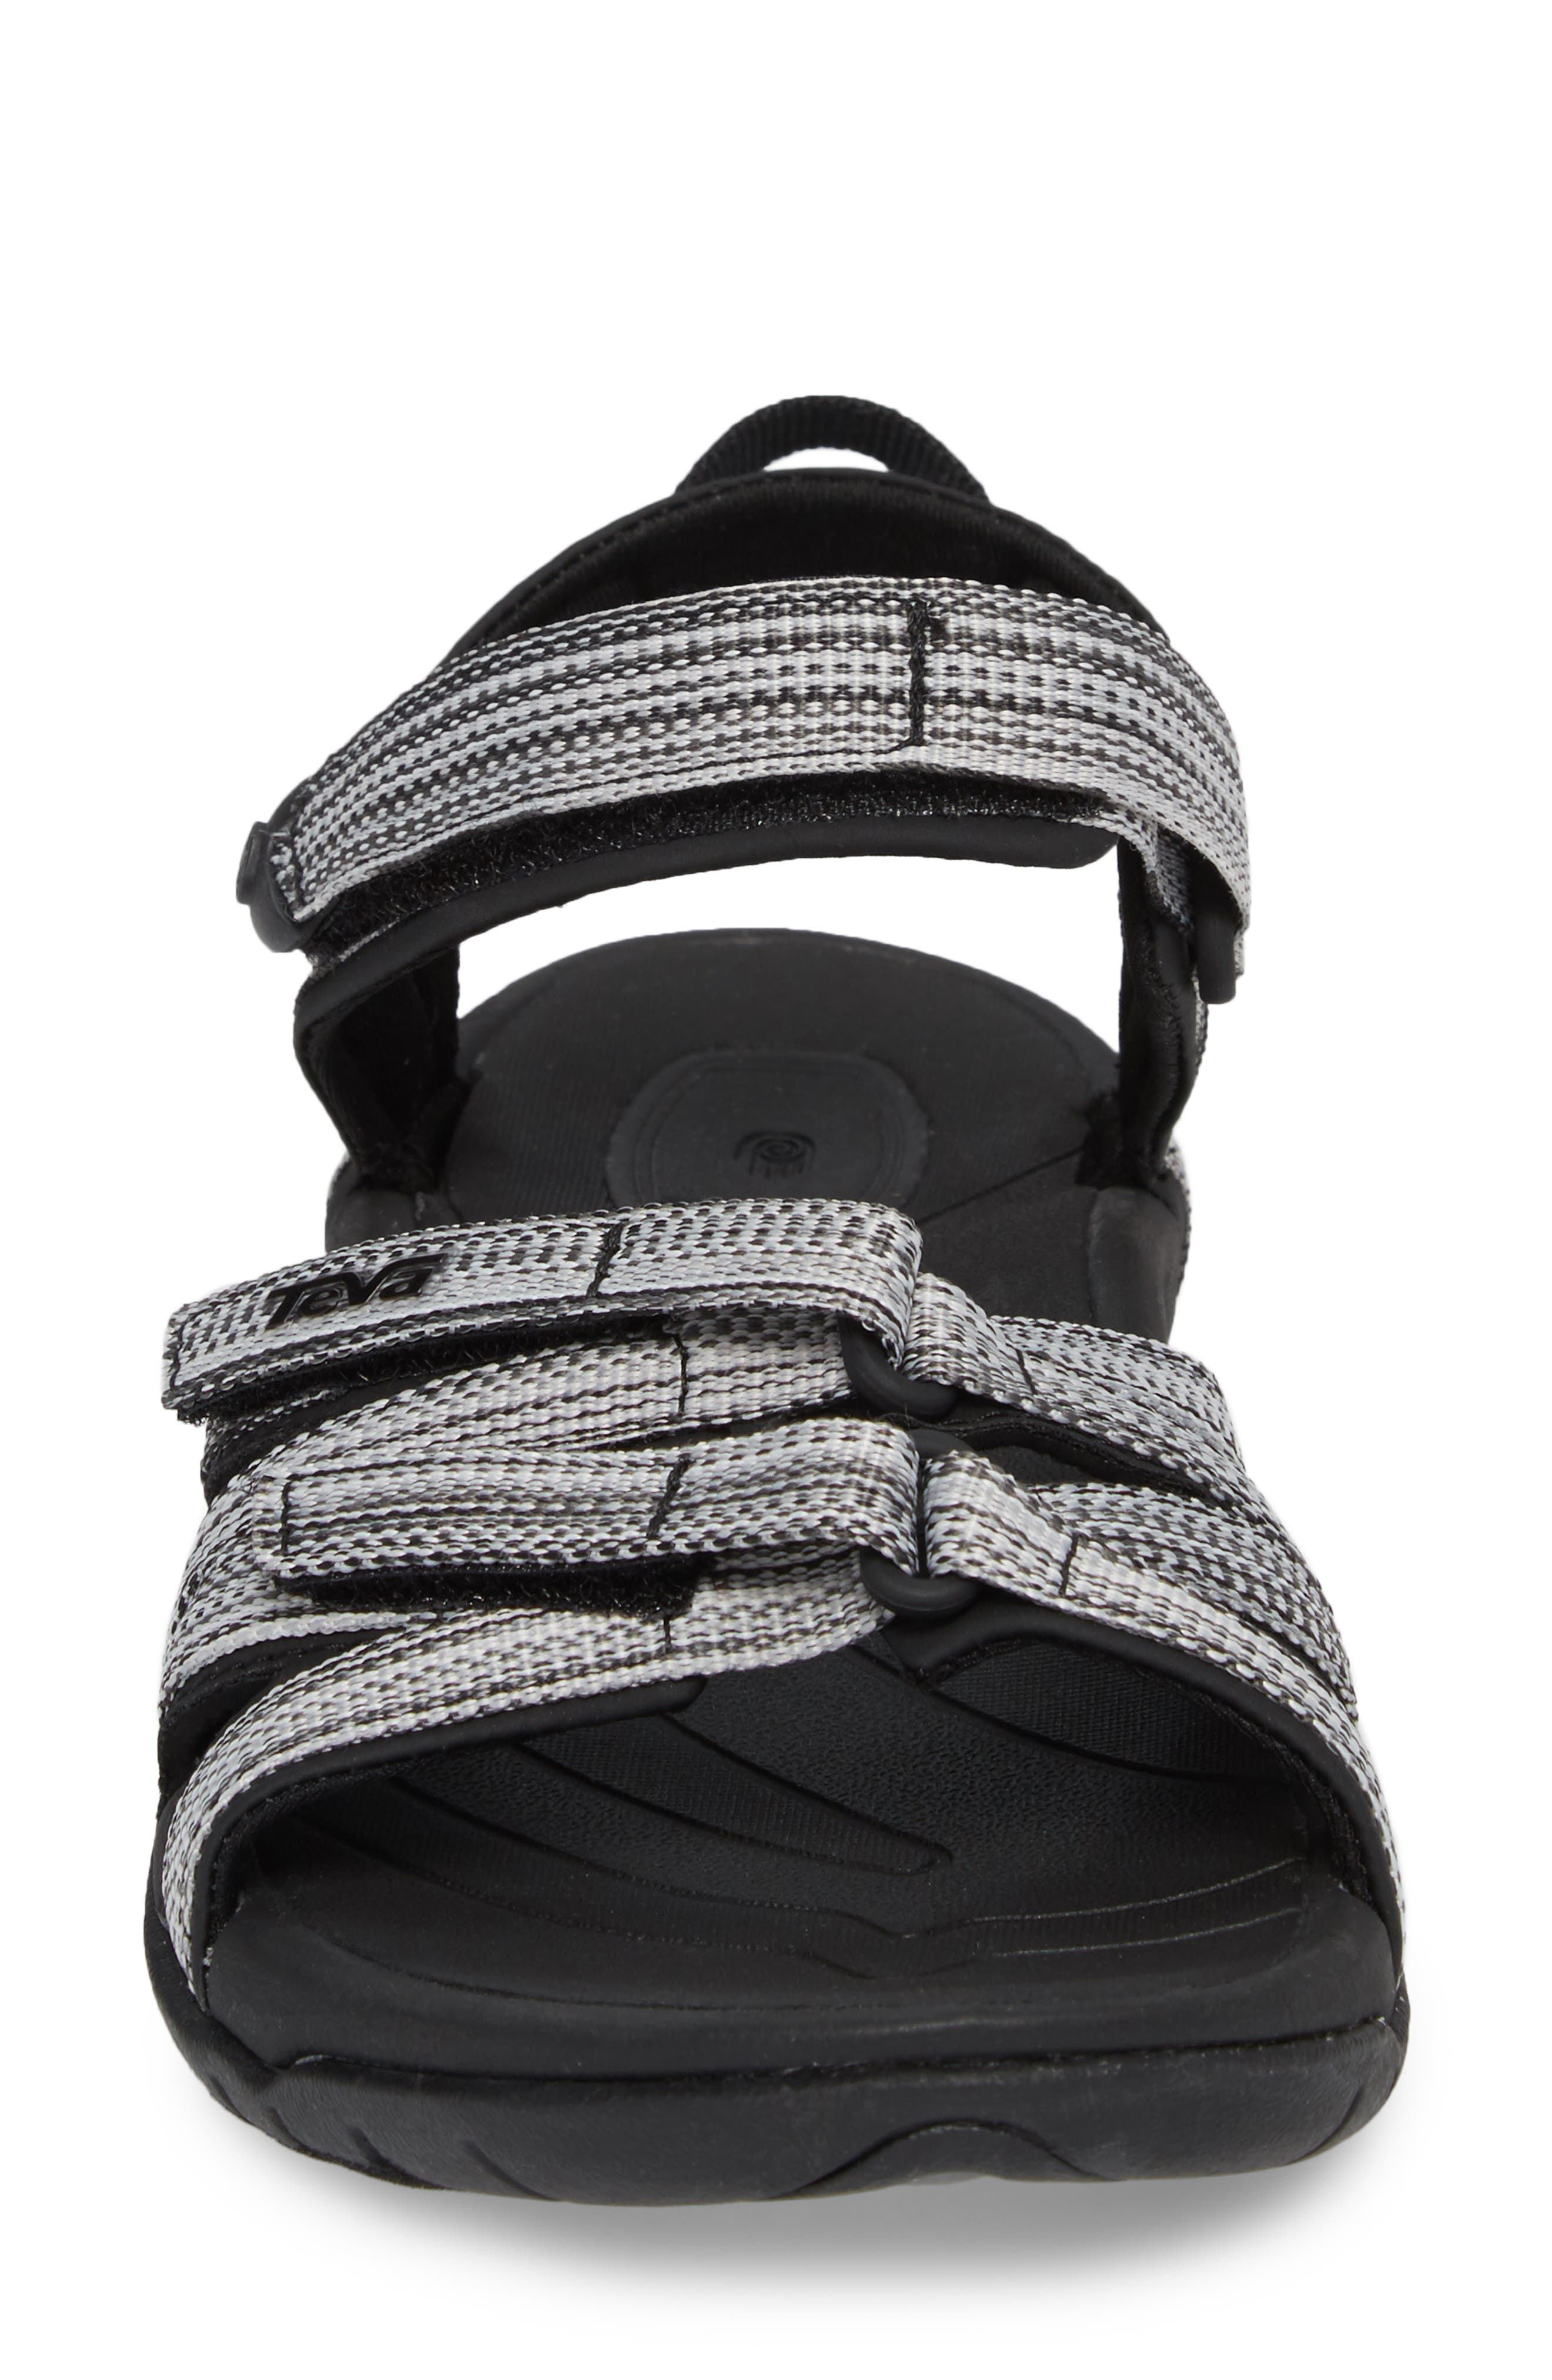 'Tirra' Sandal,                             Alternate thumbnail 4, color,                             Black/ White Multi Fabric